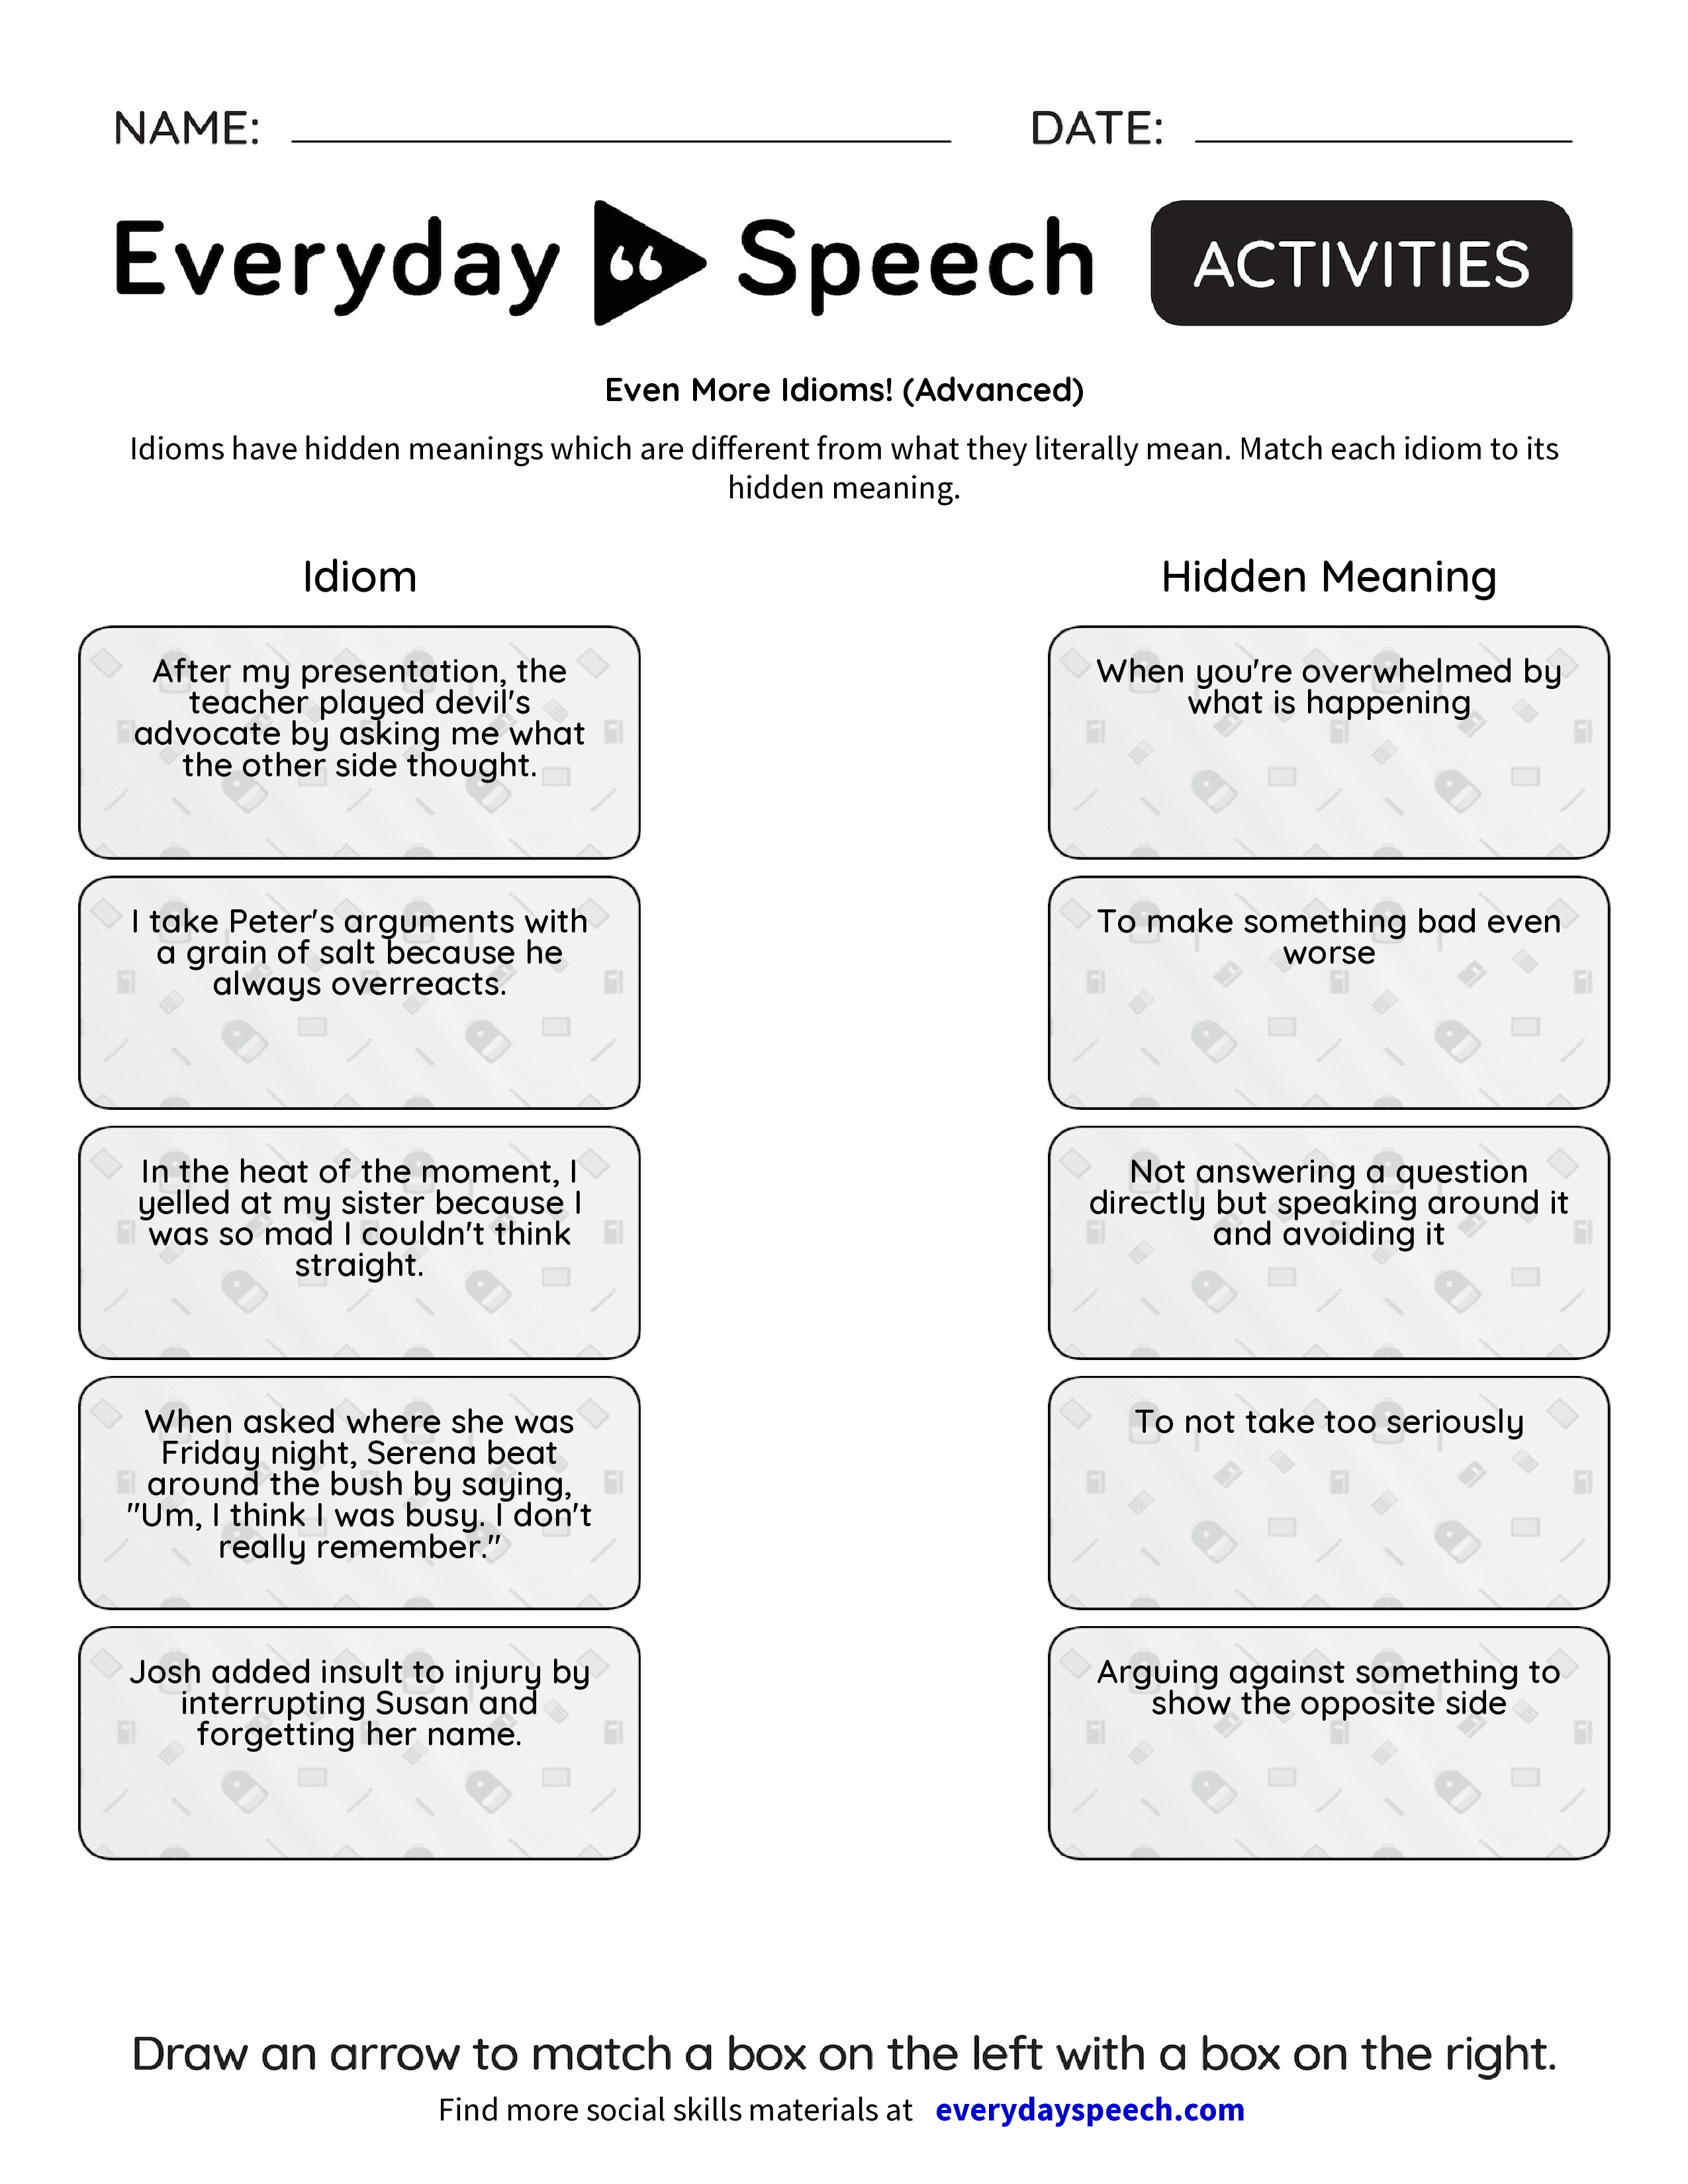 Even More Idioms Advanced Everyday Speech Everyday Speech